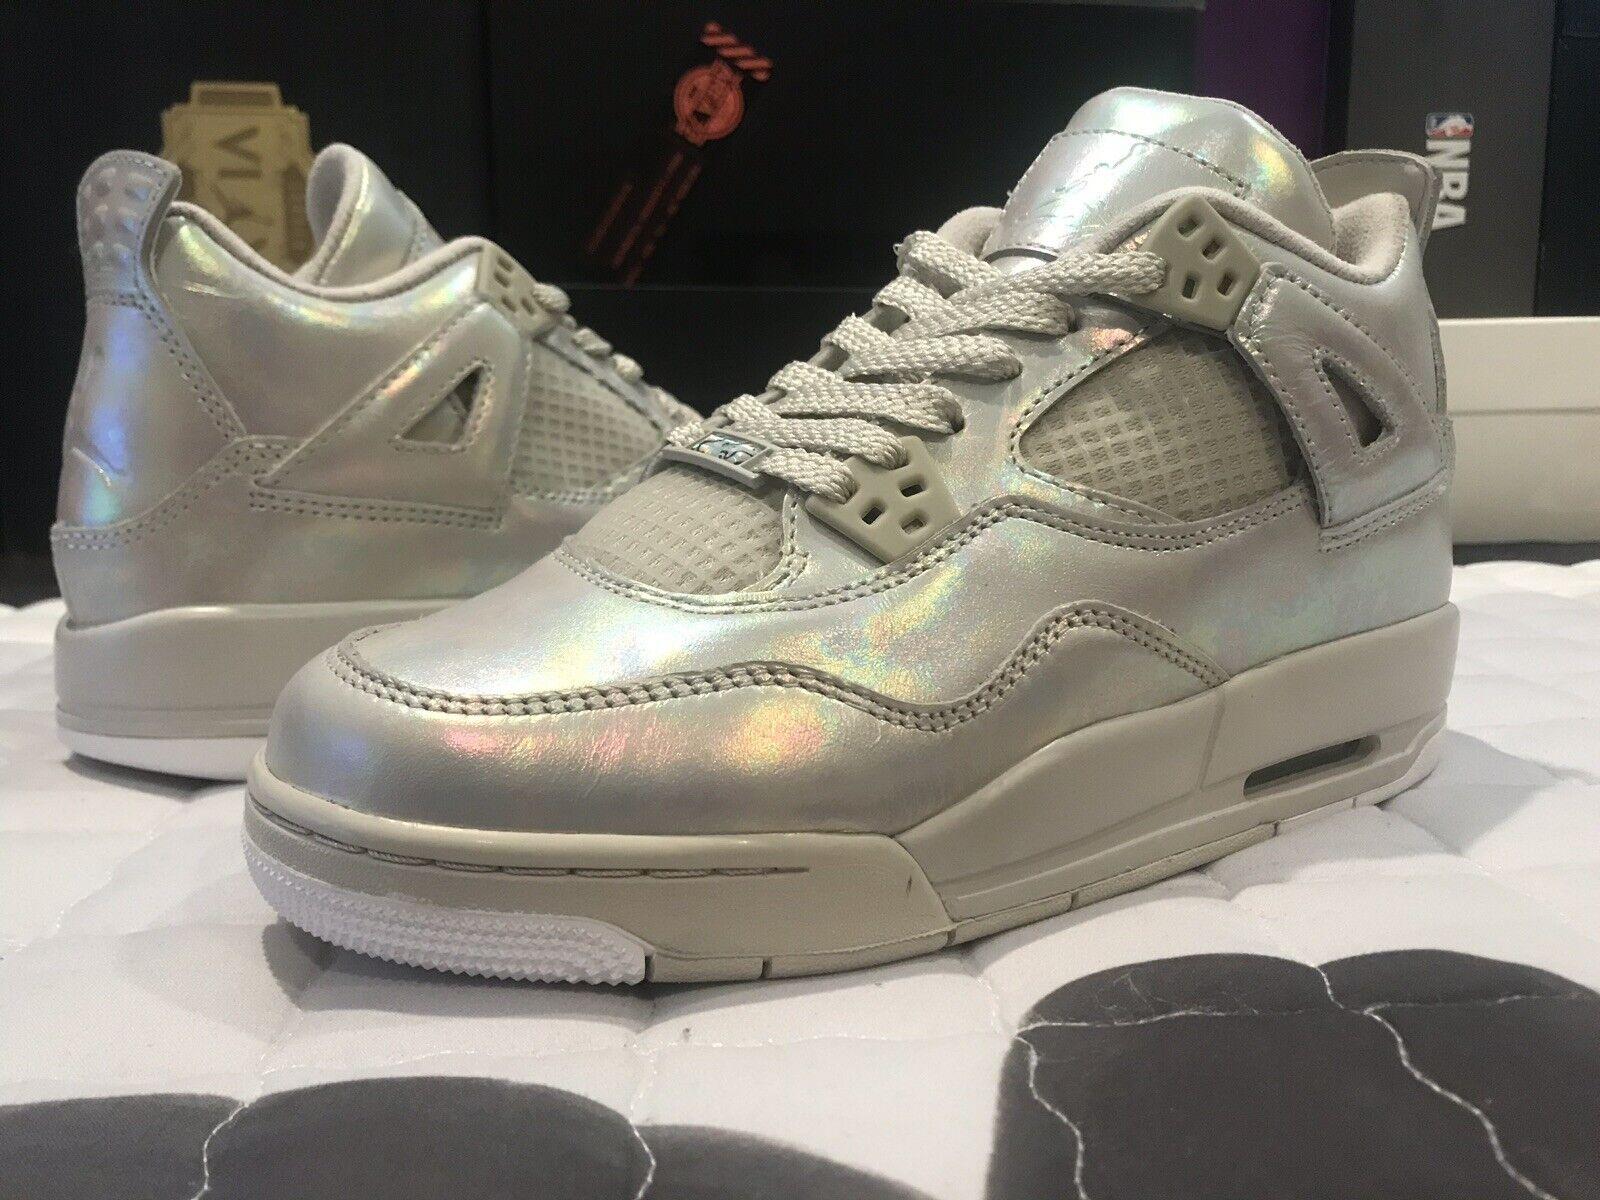 2015 New Nike Air Jordan IV 4 Retro GG PEARL sz 6Y  742639 045